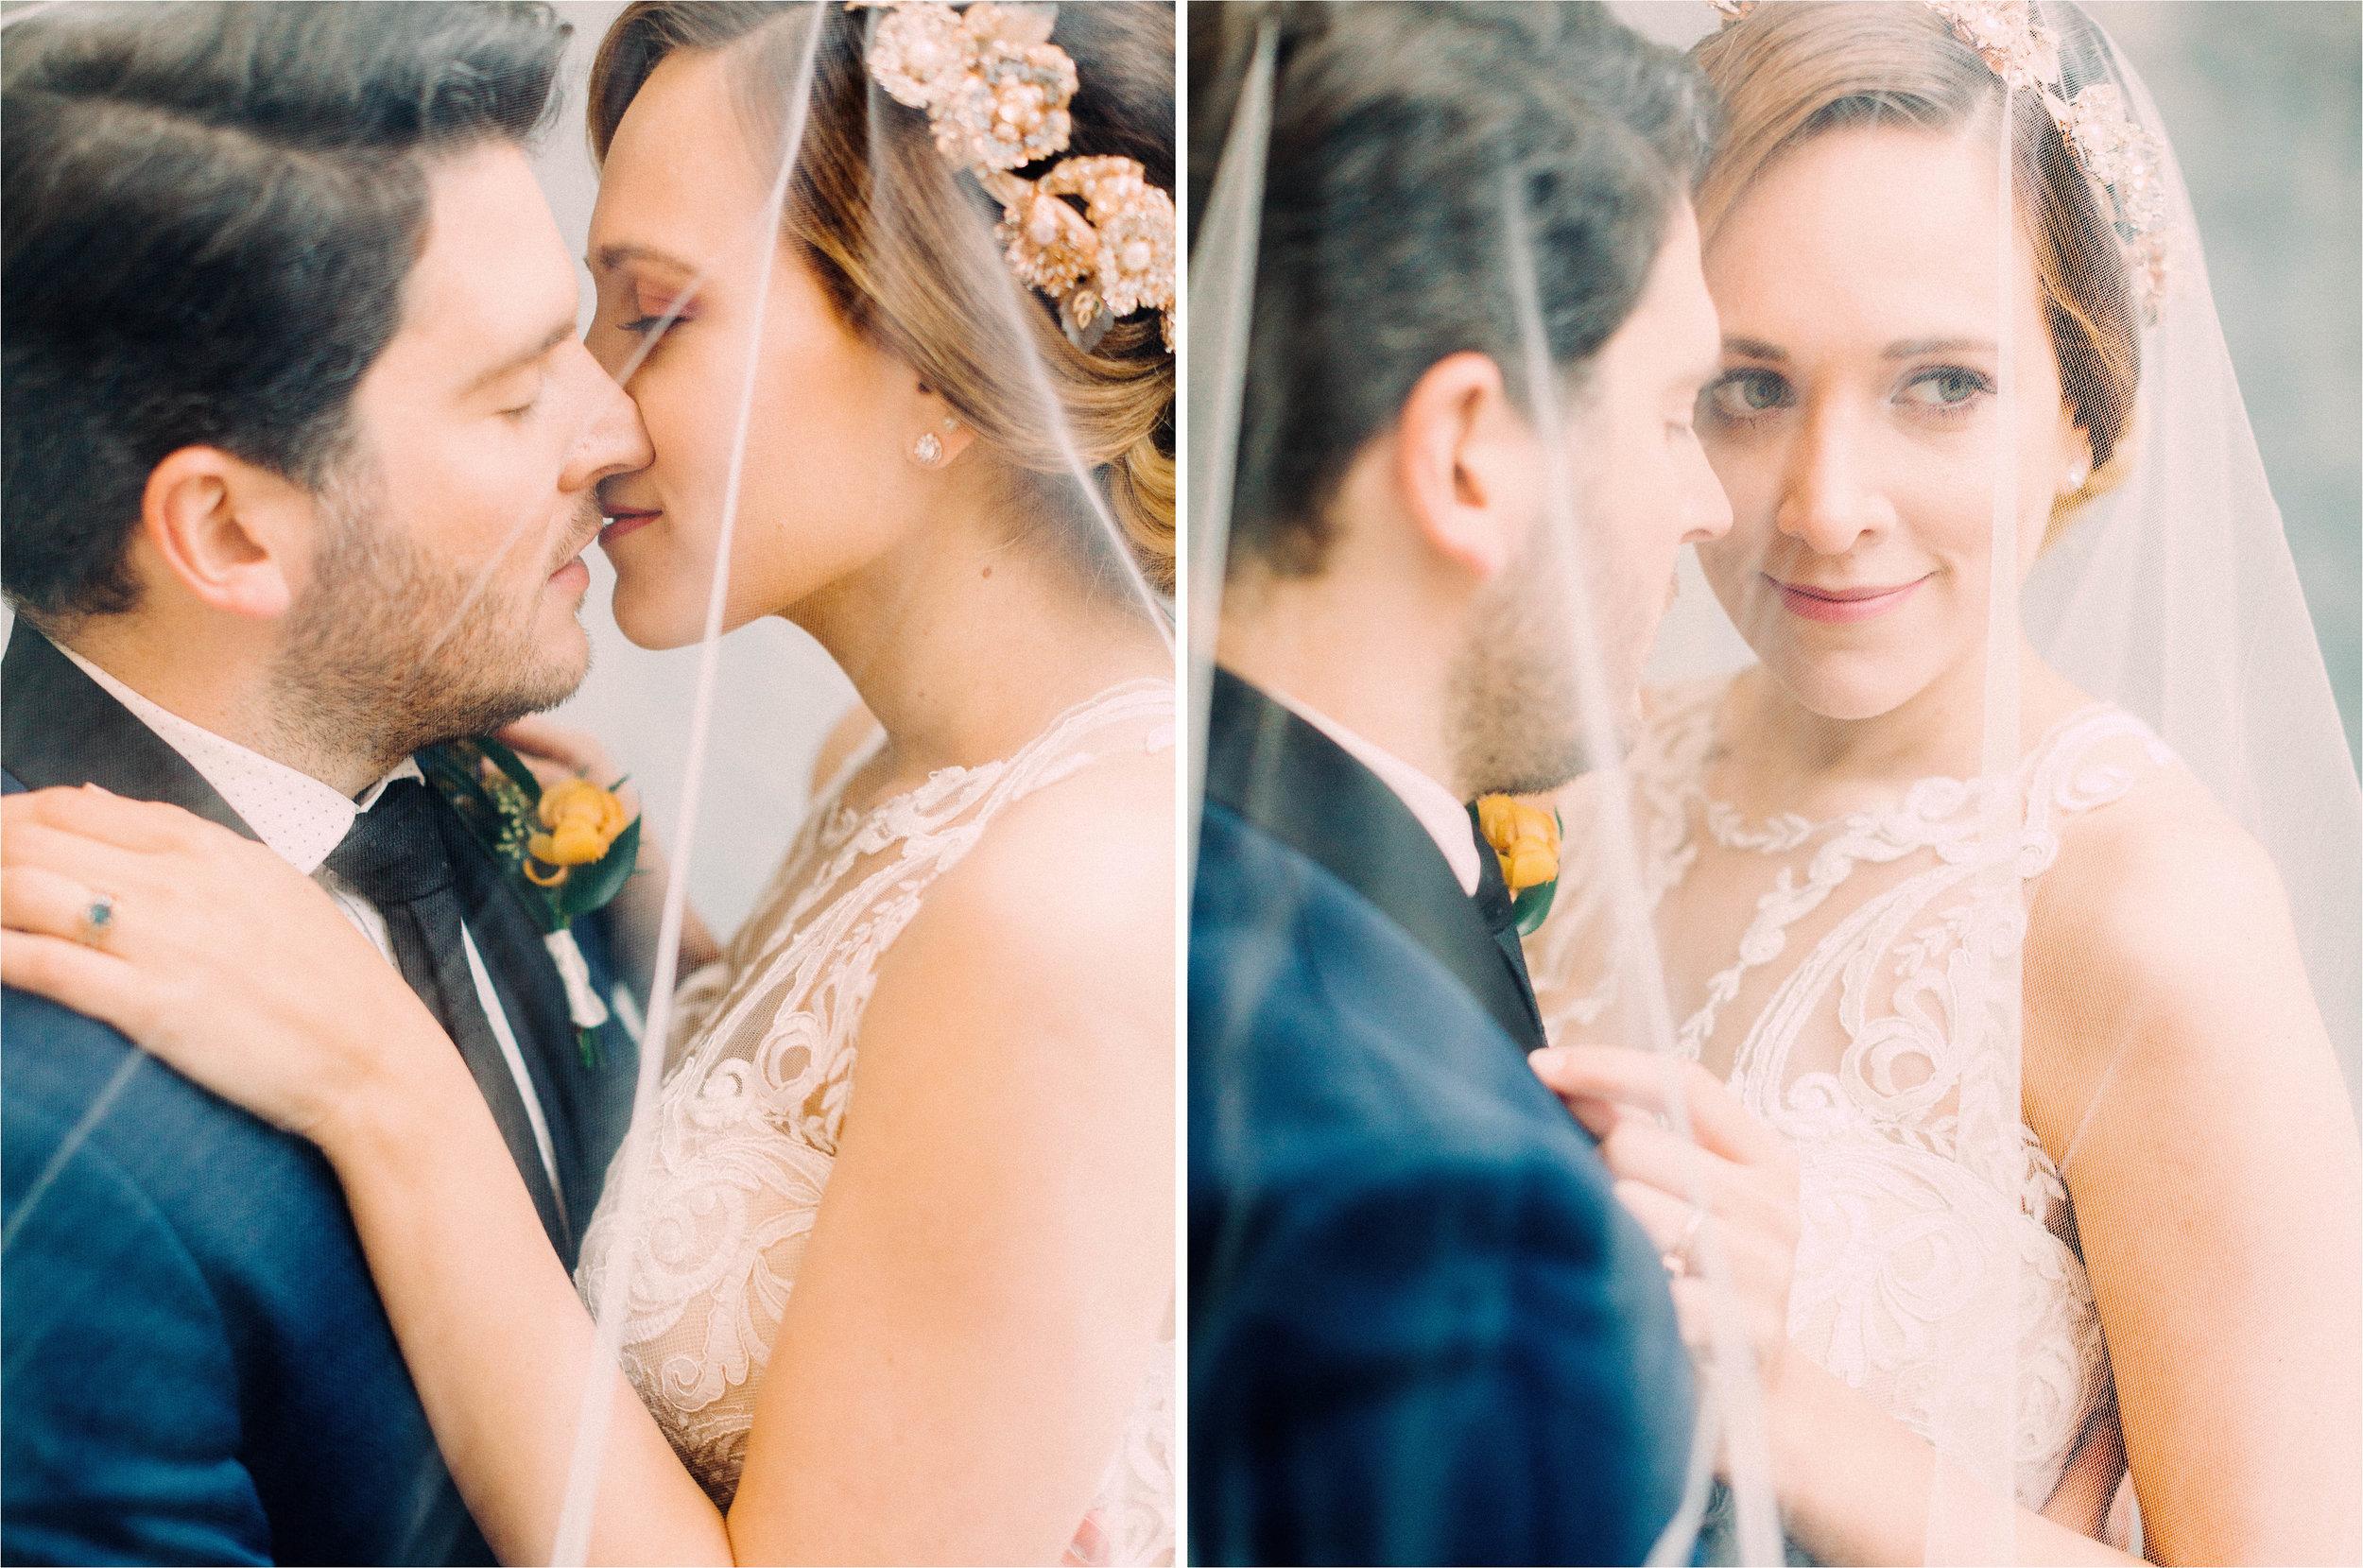 042-alaamarzouk-alaamarzoukphotography-mcallenweddingphotographer-alaa-marzouk-mcallen-mission-wedding-texas-venue-photography-wedding-california-bride-bridal-engagement-austin-elopement-houston.jpg